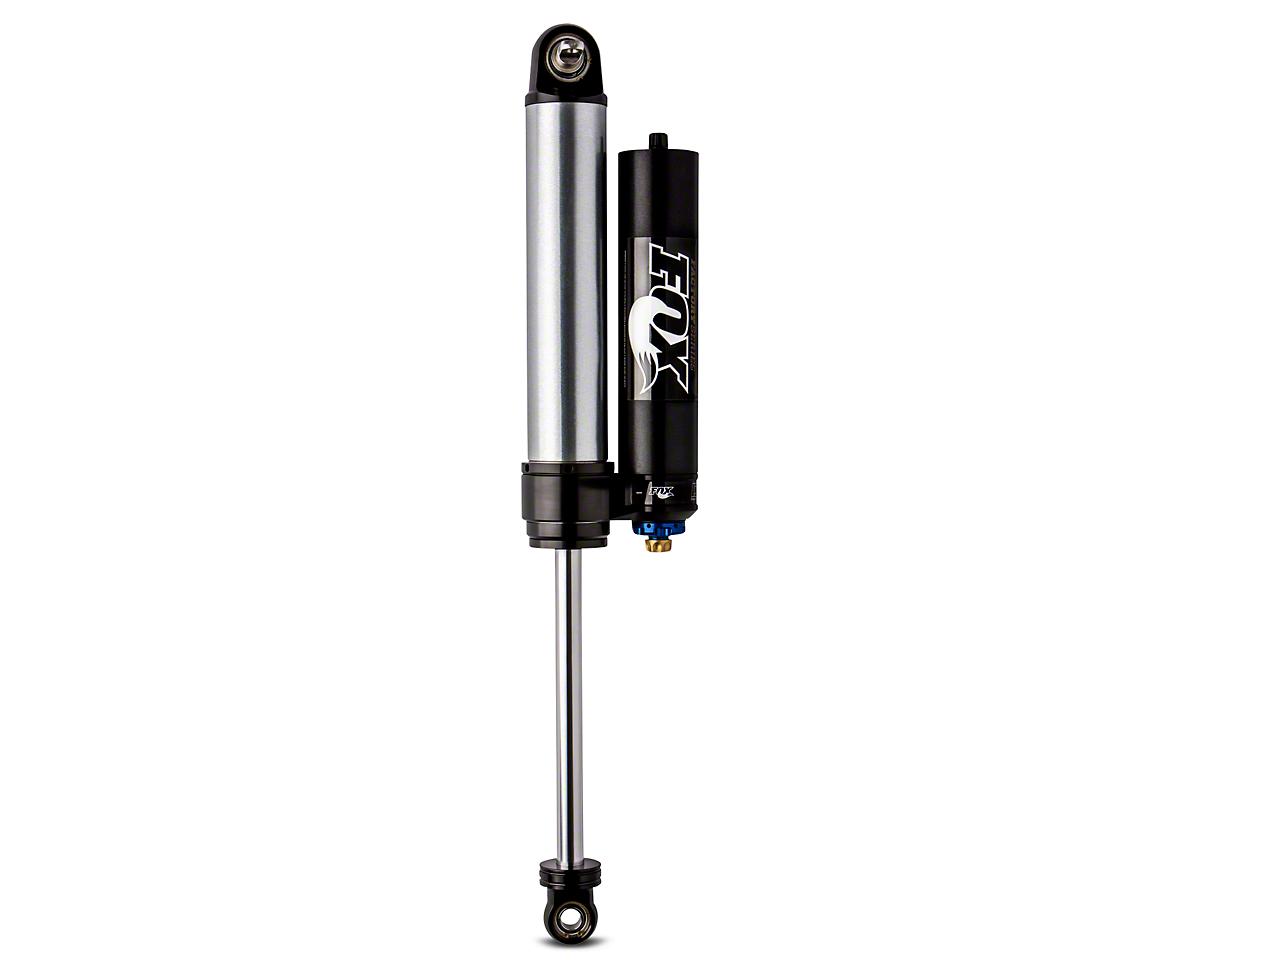 FOX 2.5 Factory Series Reservoir w/ DSC Adjuster for 4-6 in. Lift - Rear (07-18 Wrangler JK)